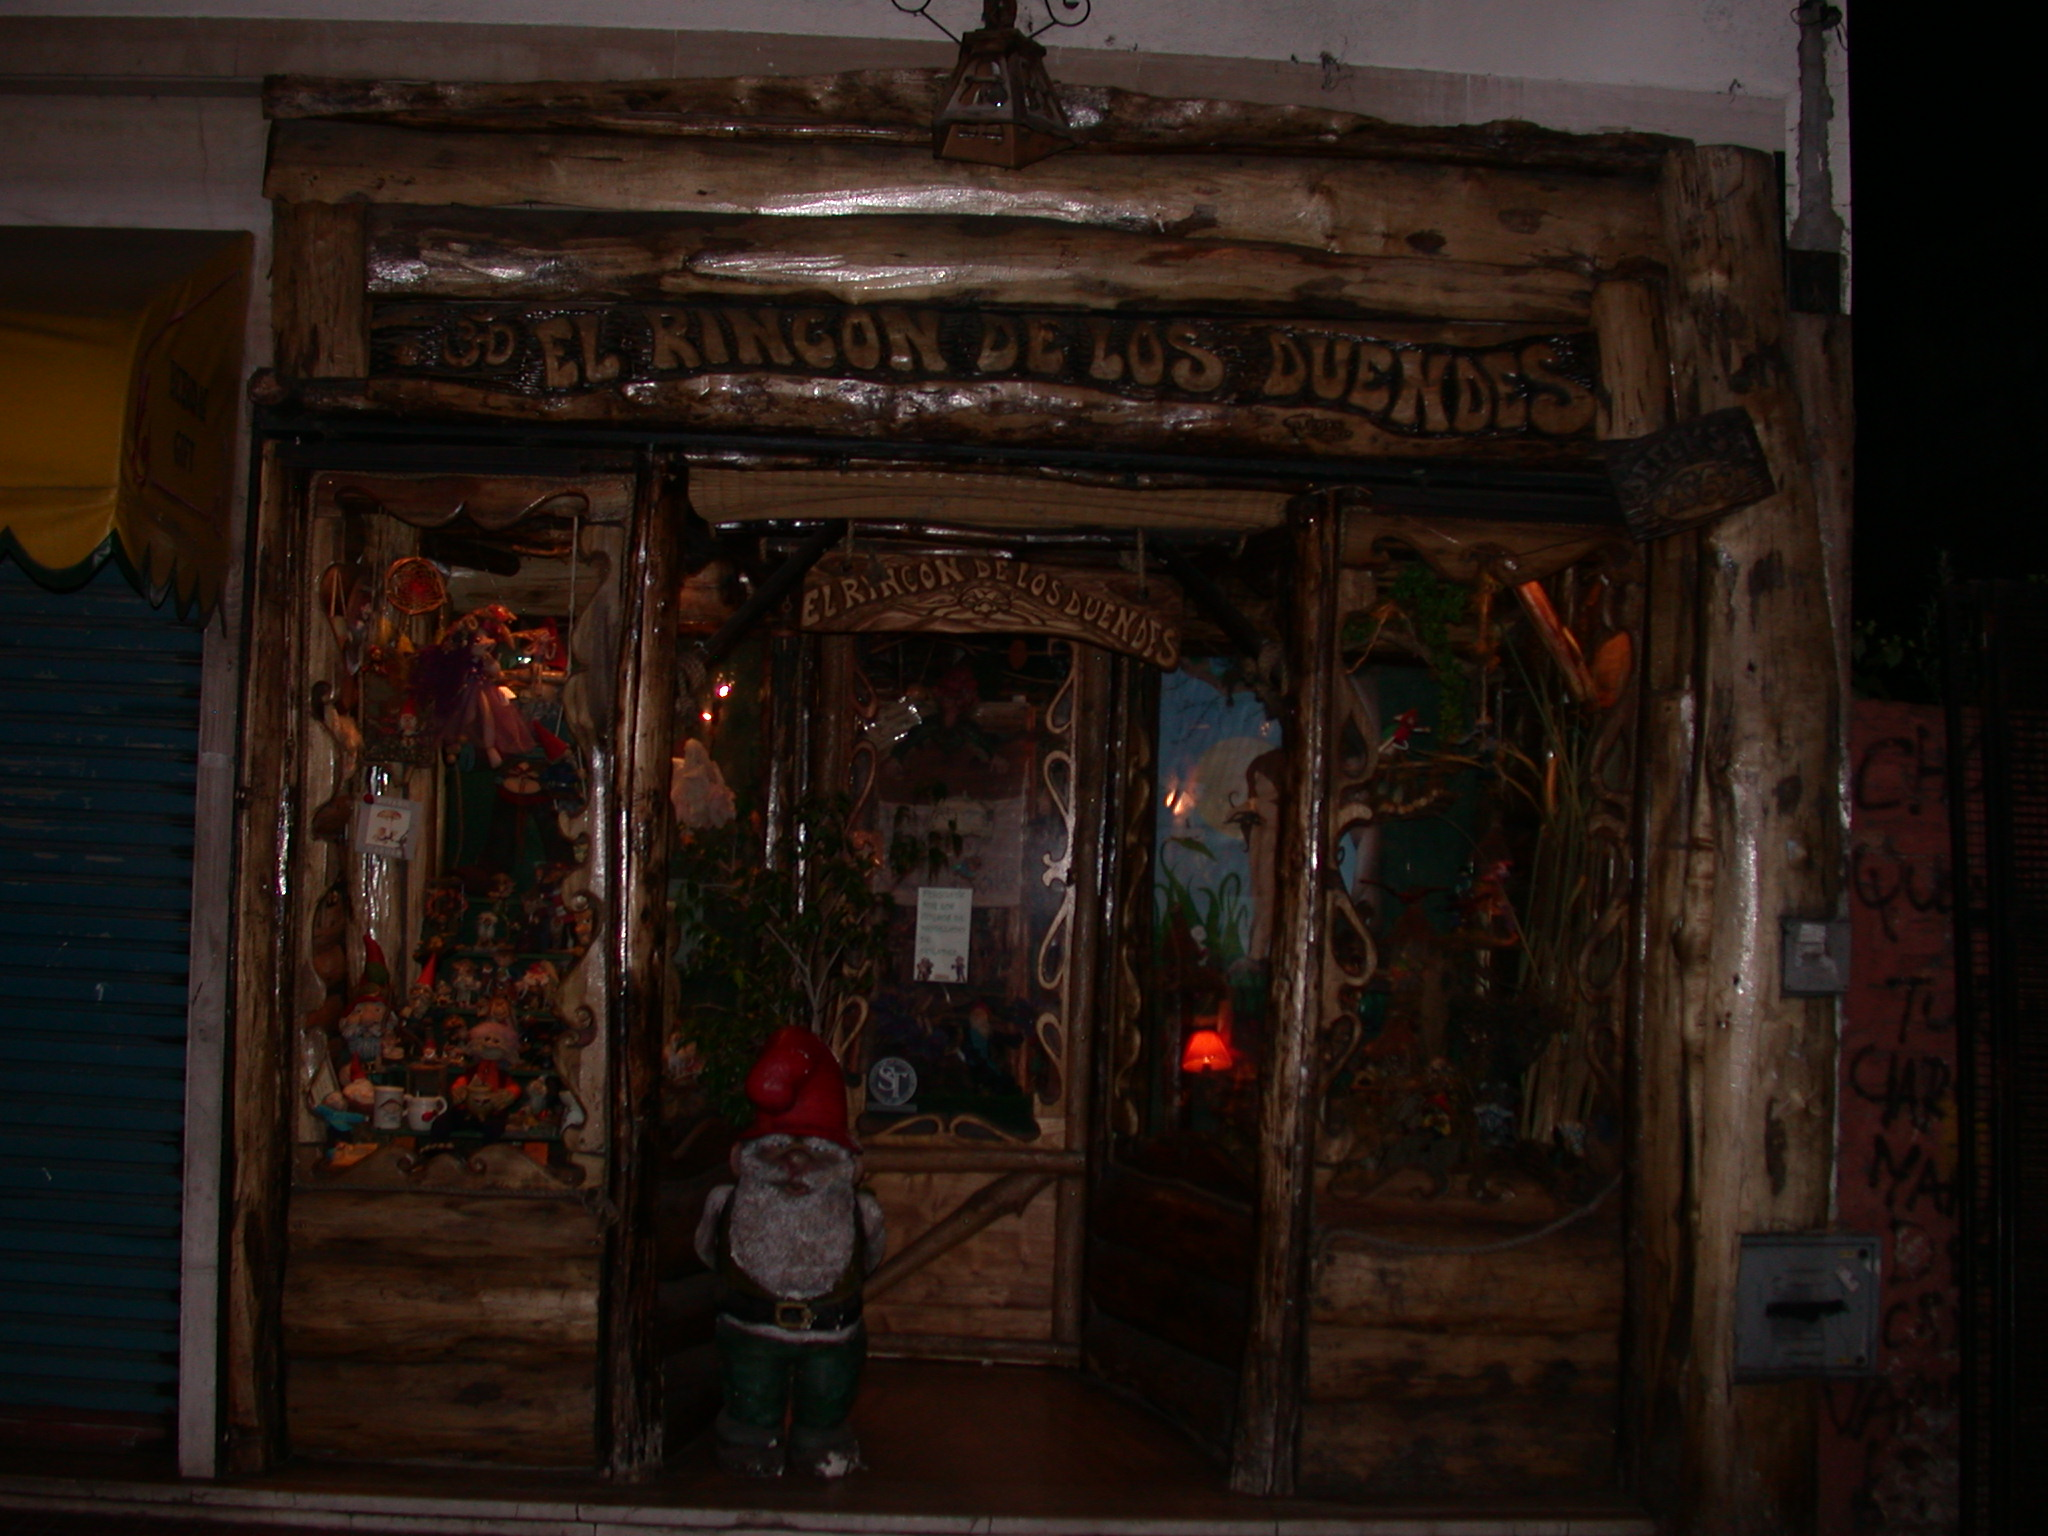 Faerie Shoppe, San Telmo, Buenos Aires, Argentina